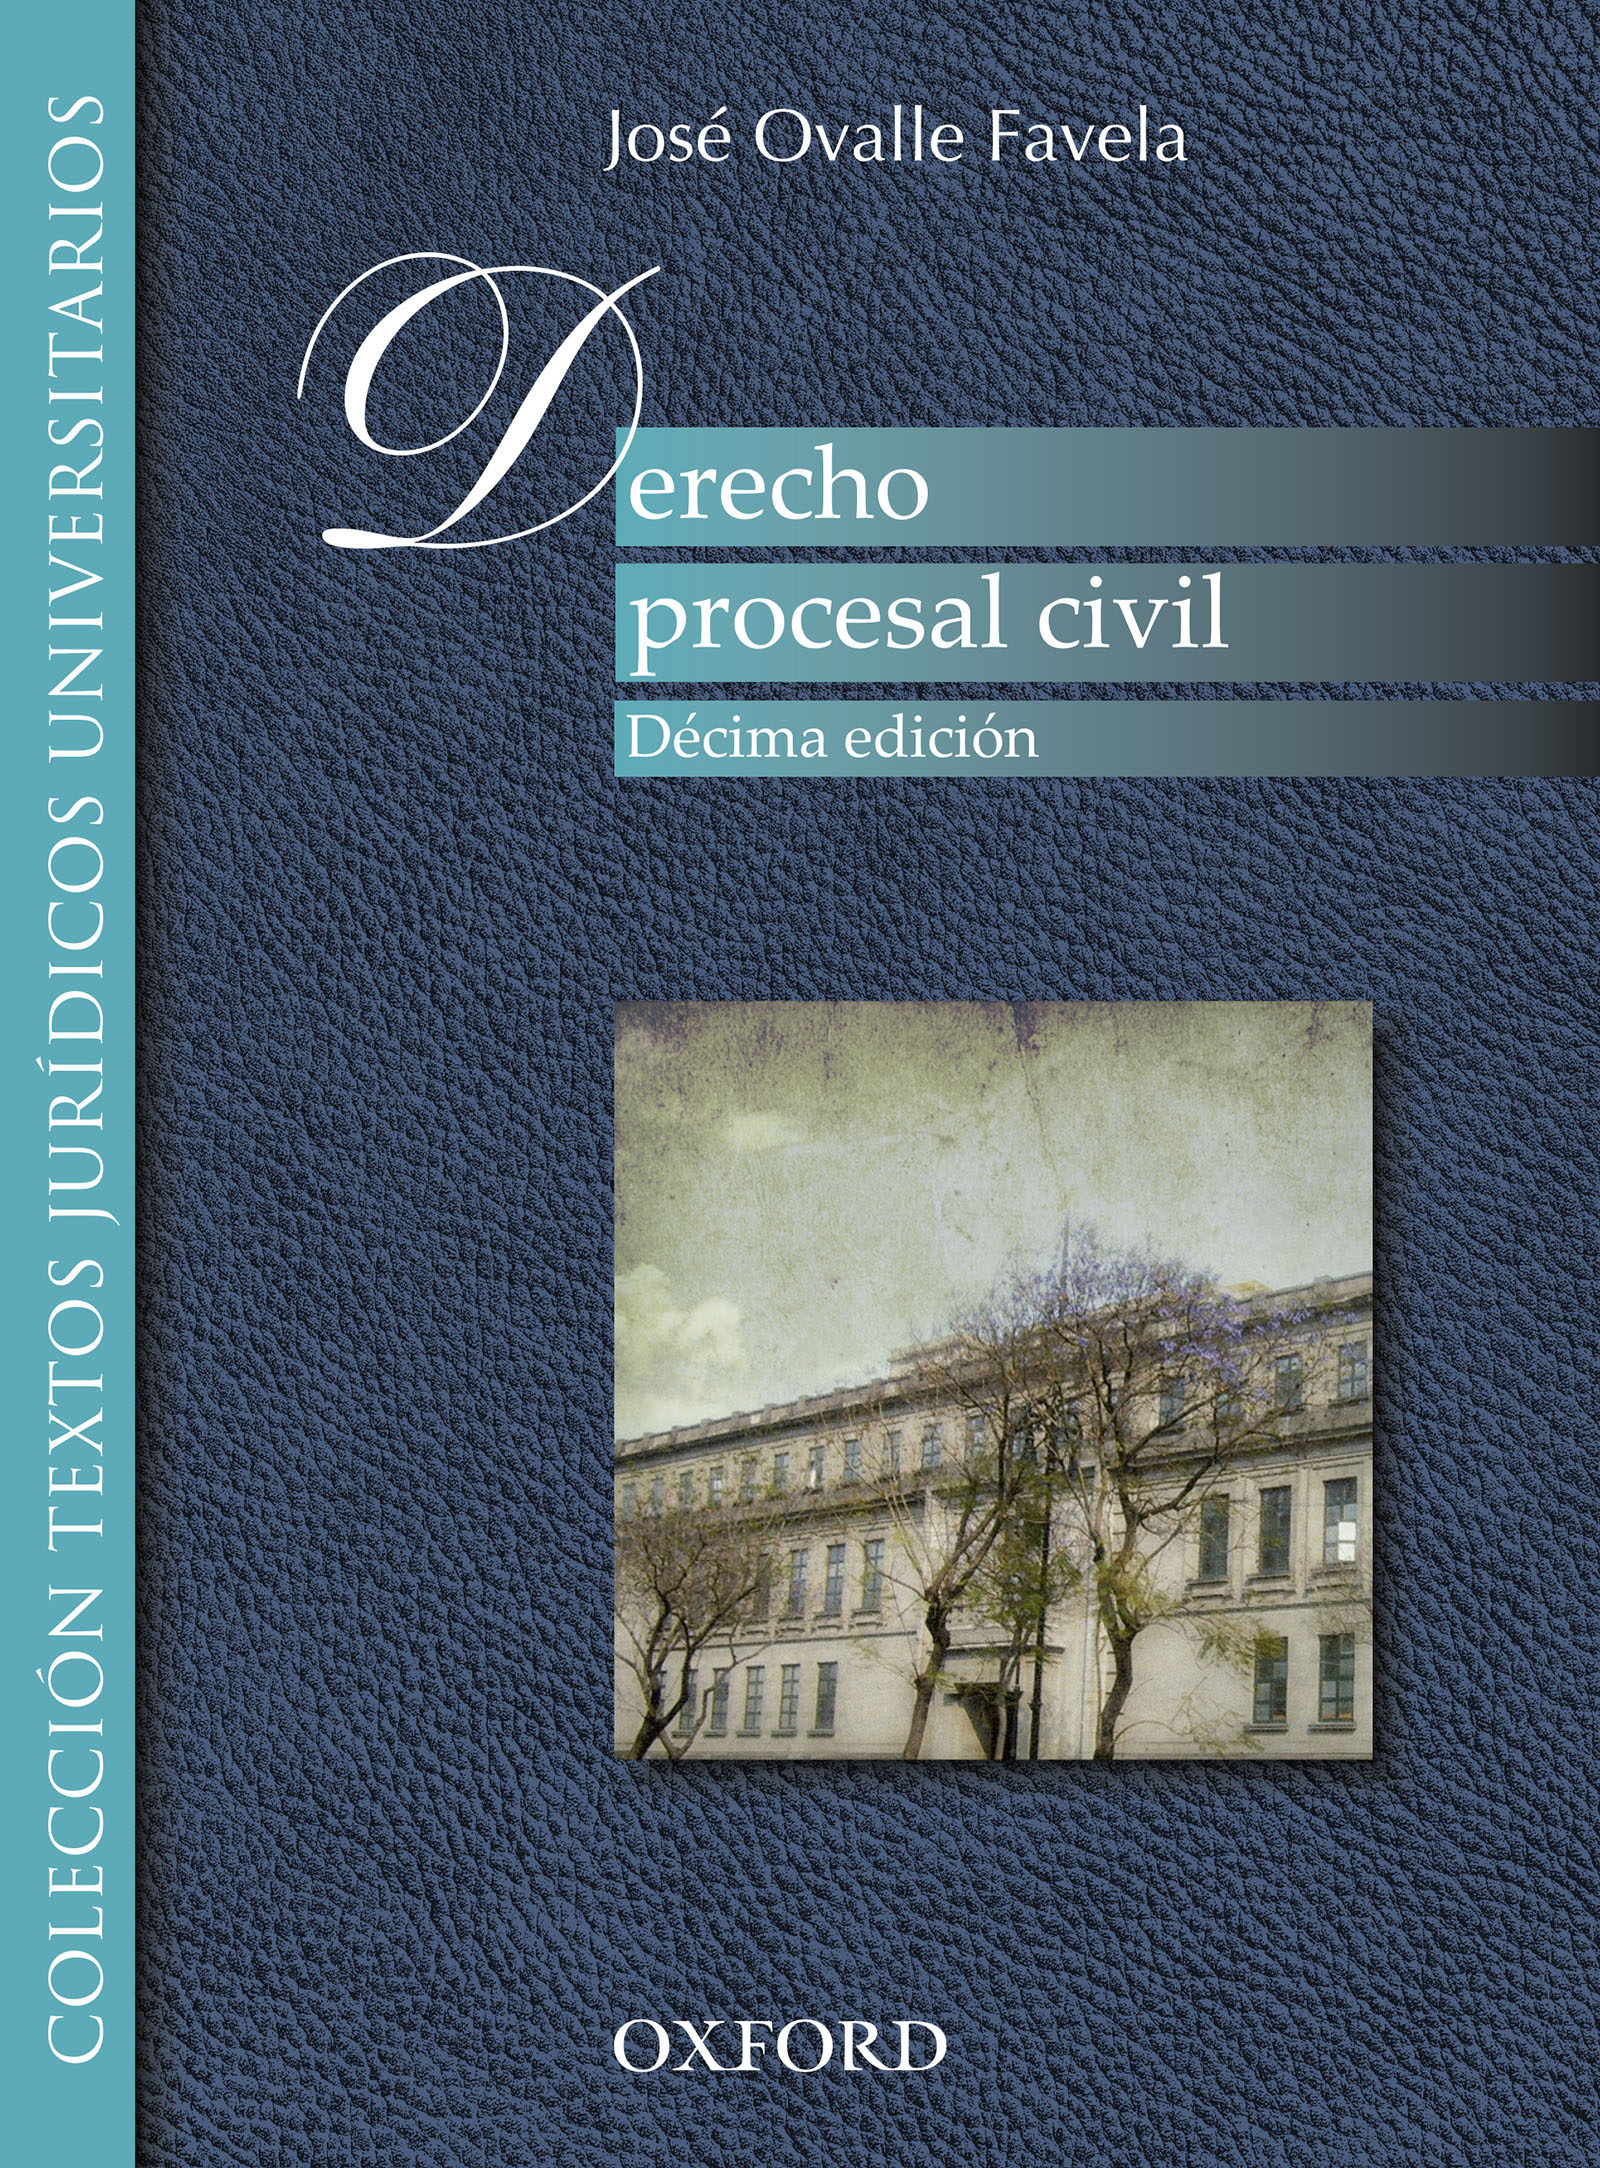 derecho procesal civil ovalle favela pdf gratis